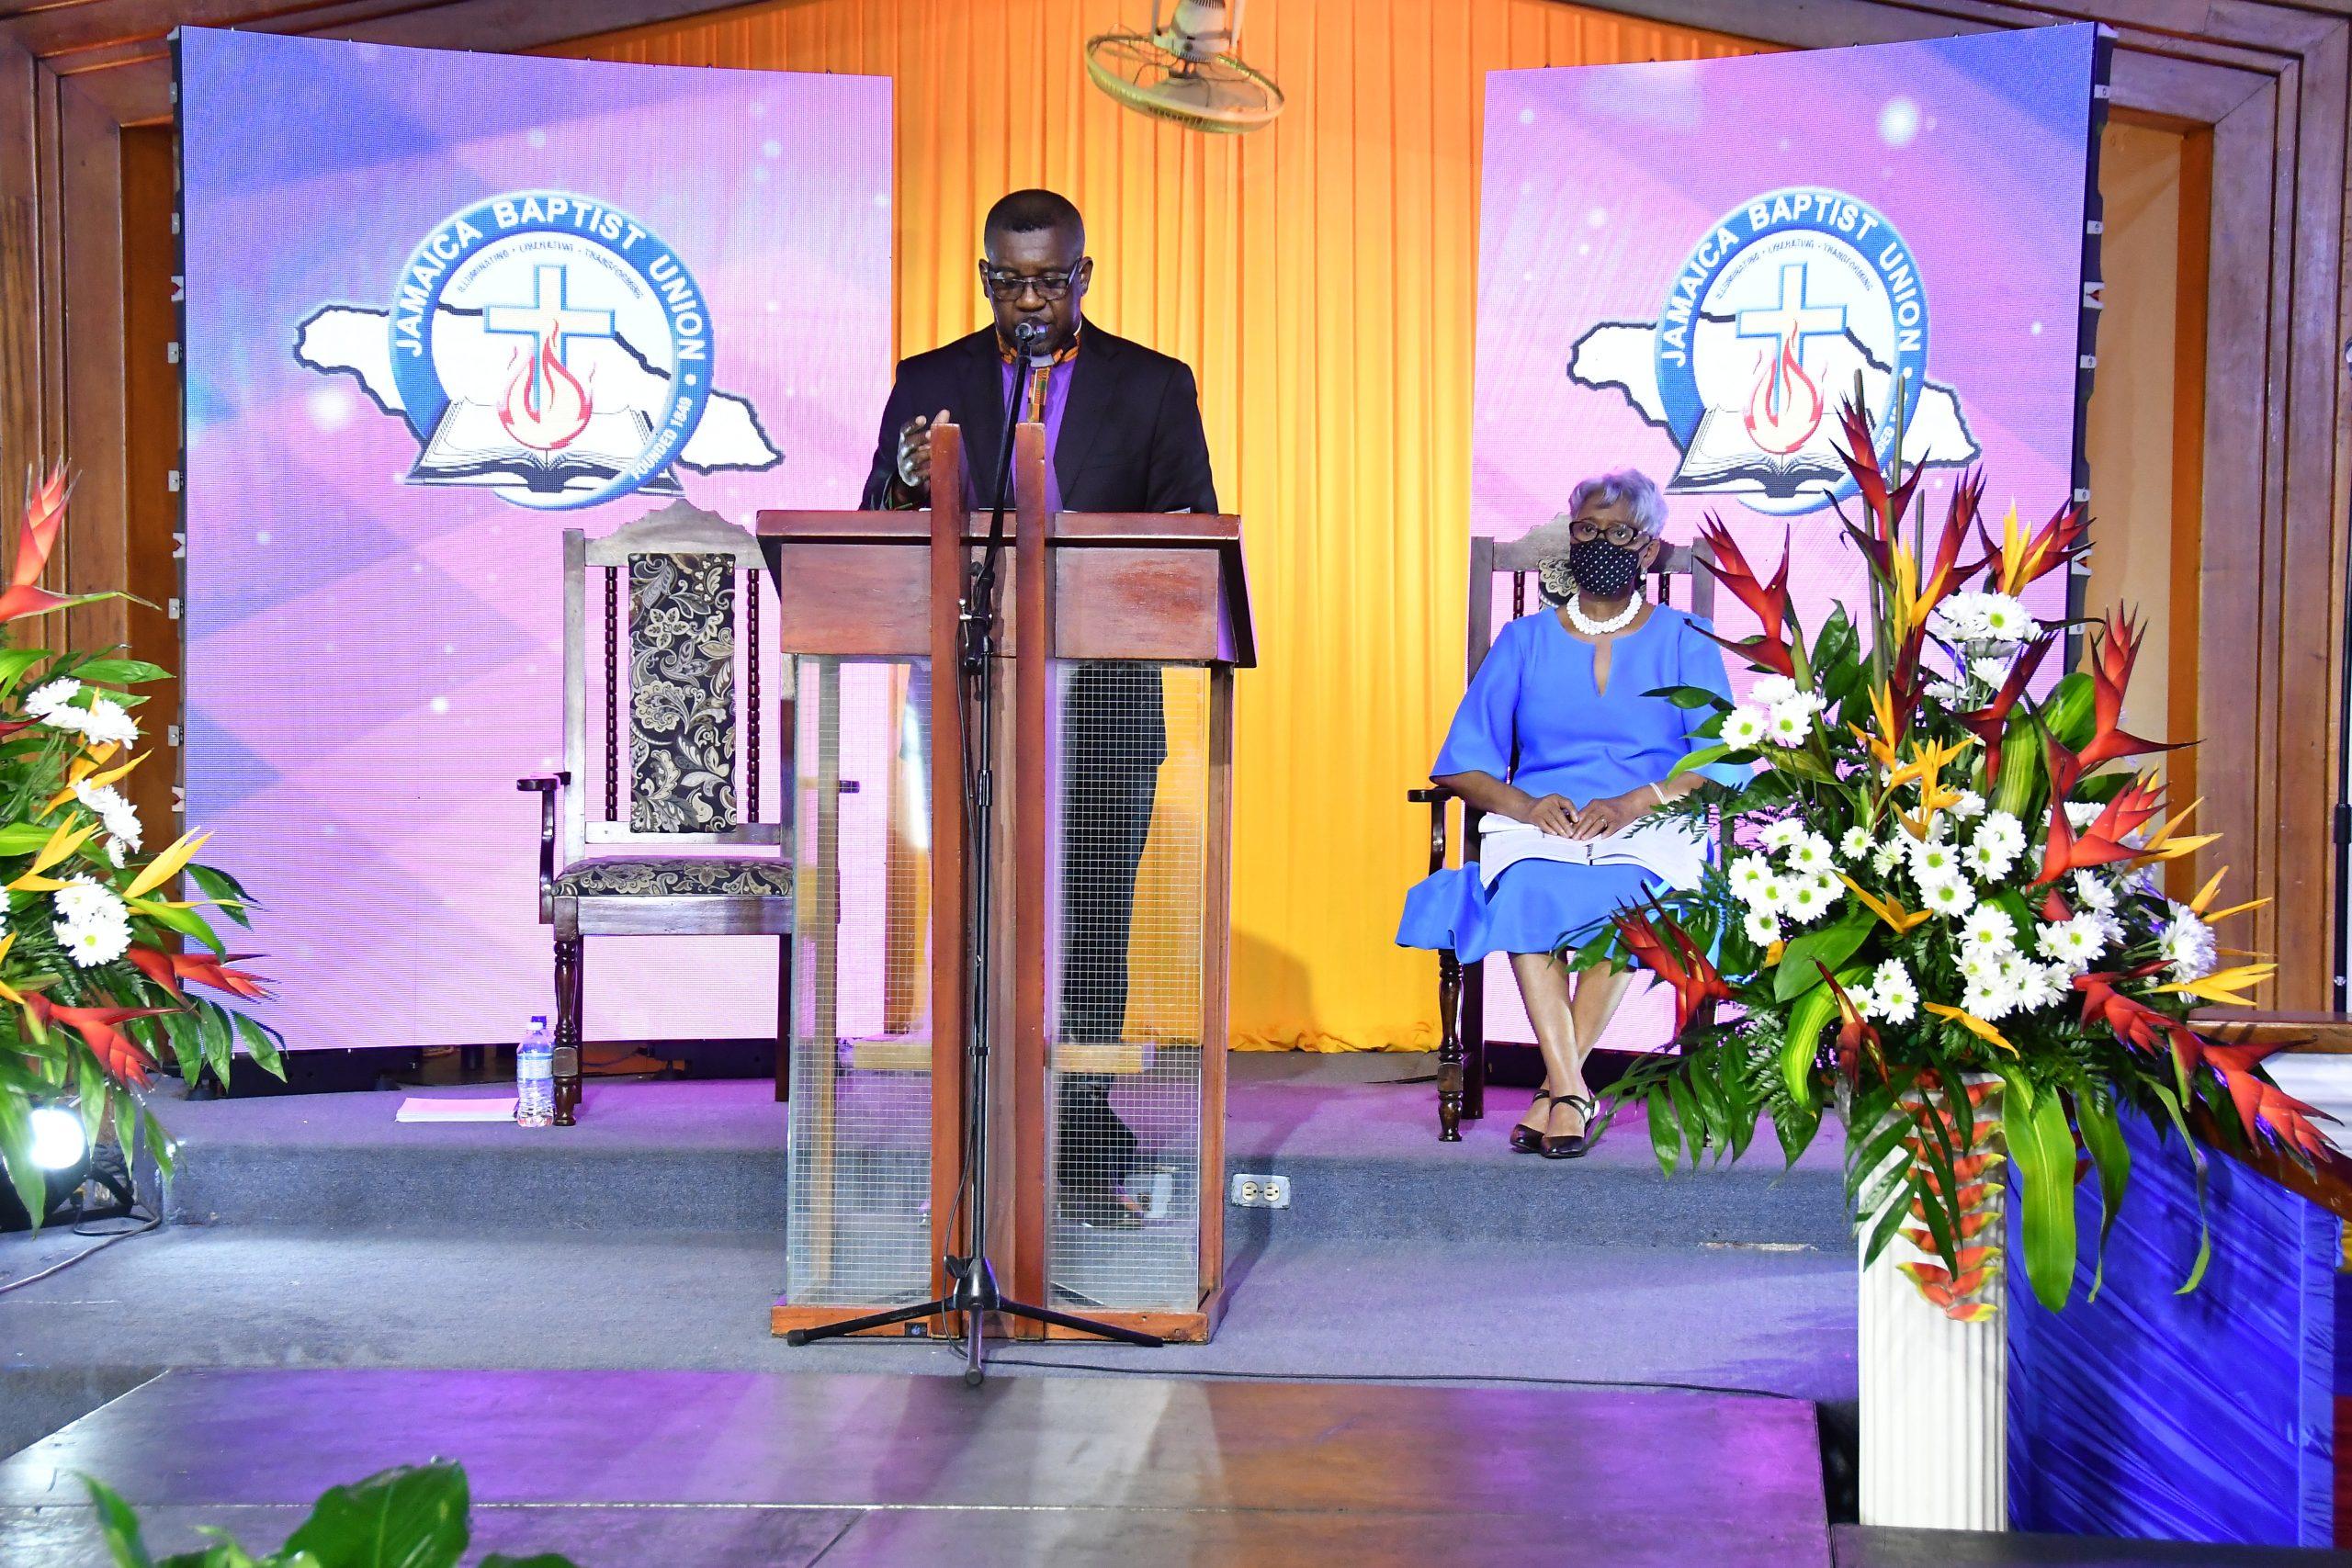 JBU President challenges Christians to reaffirm identity.